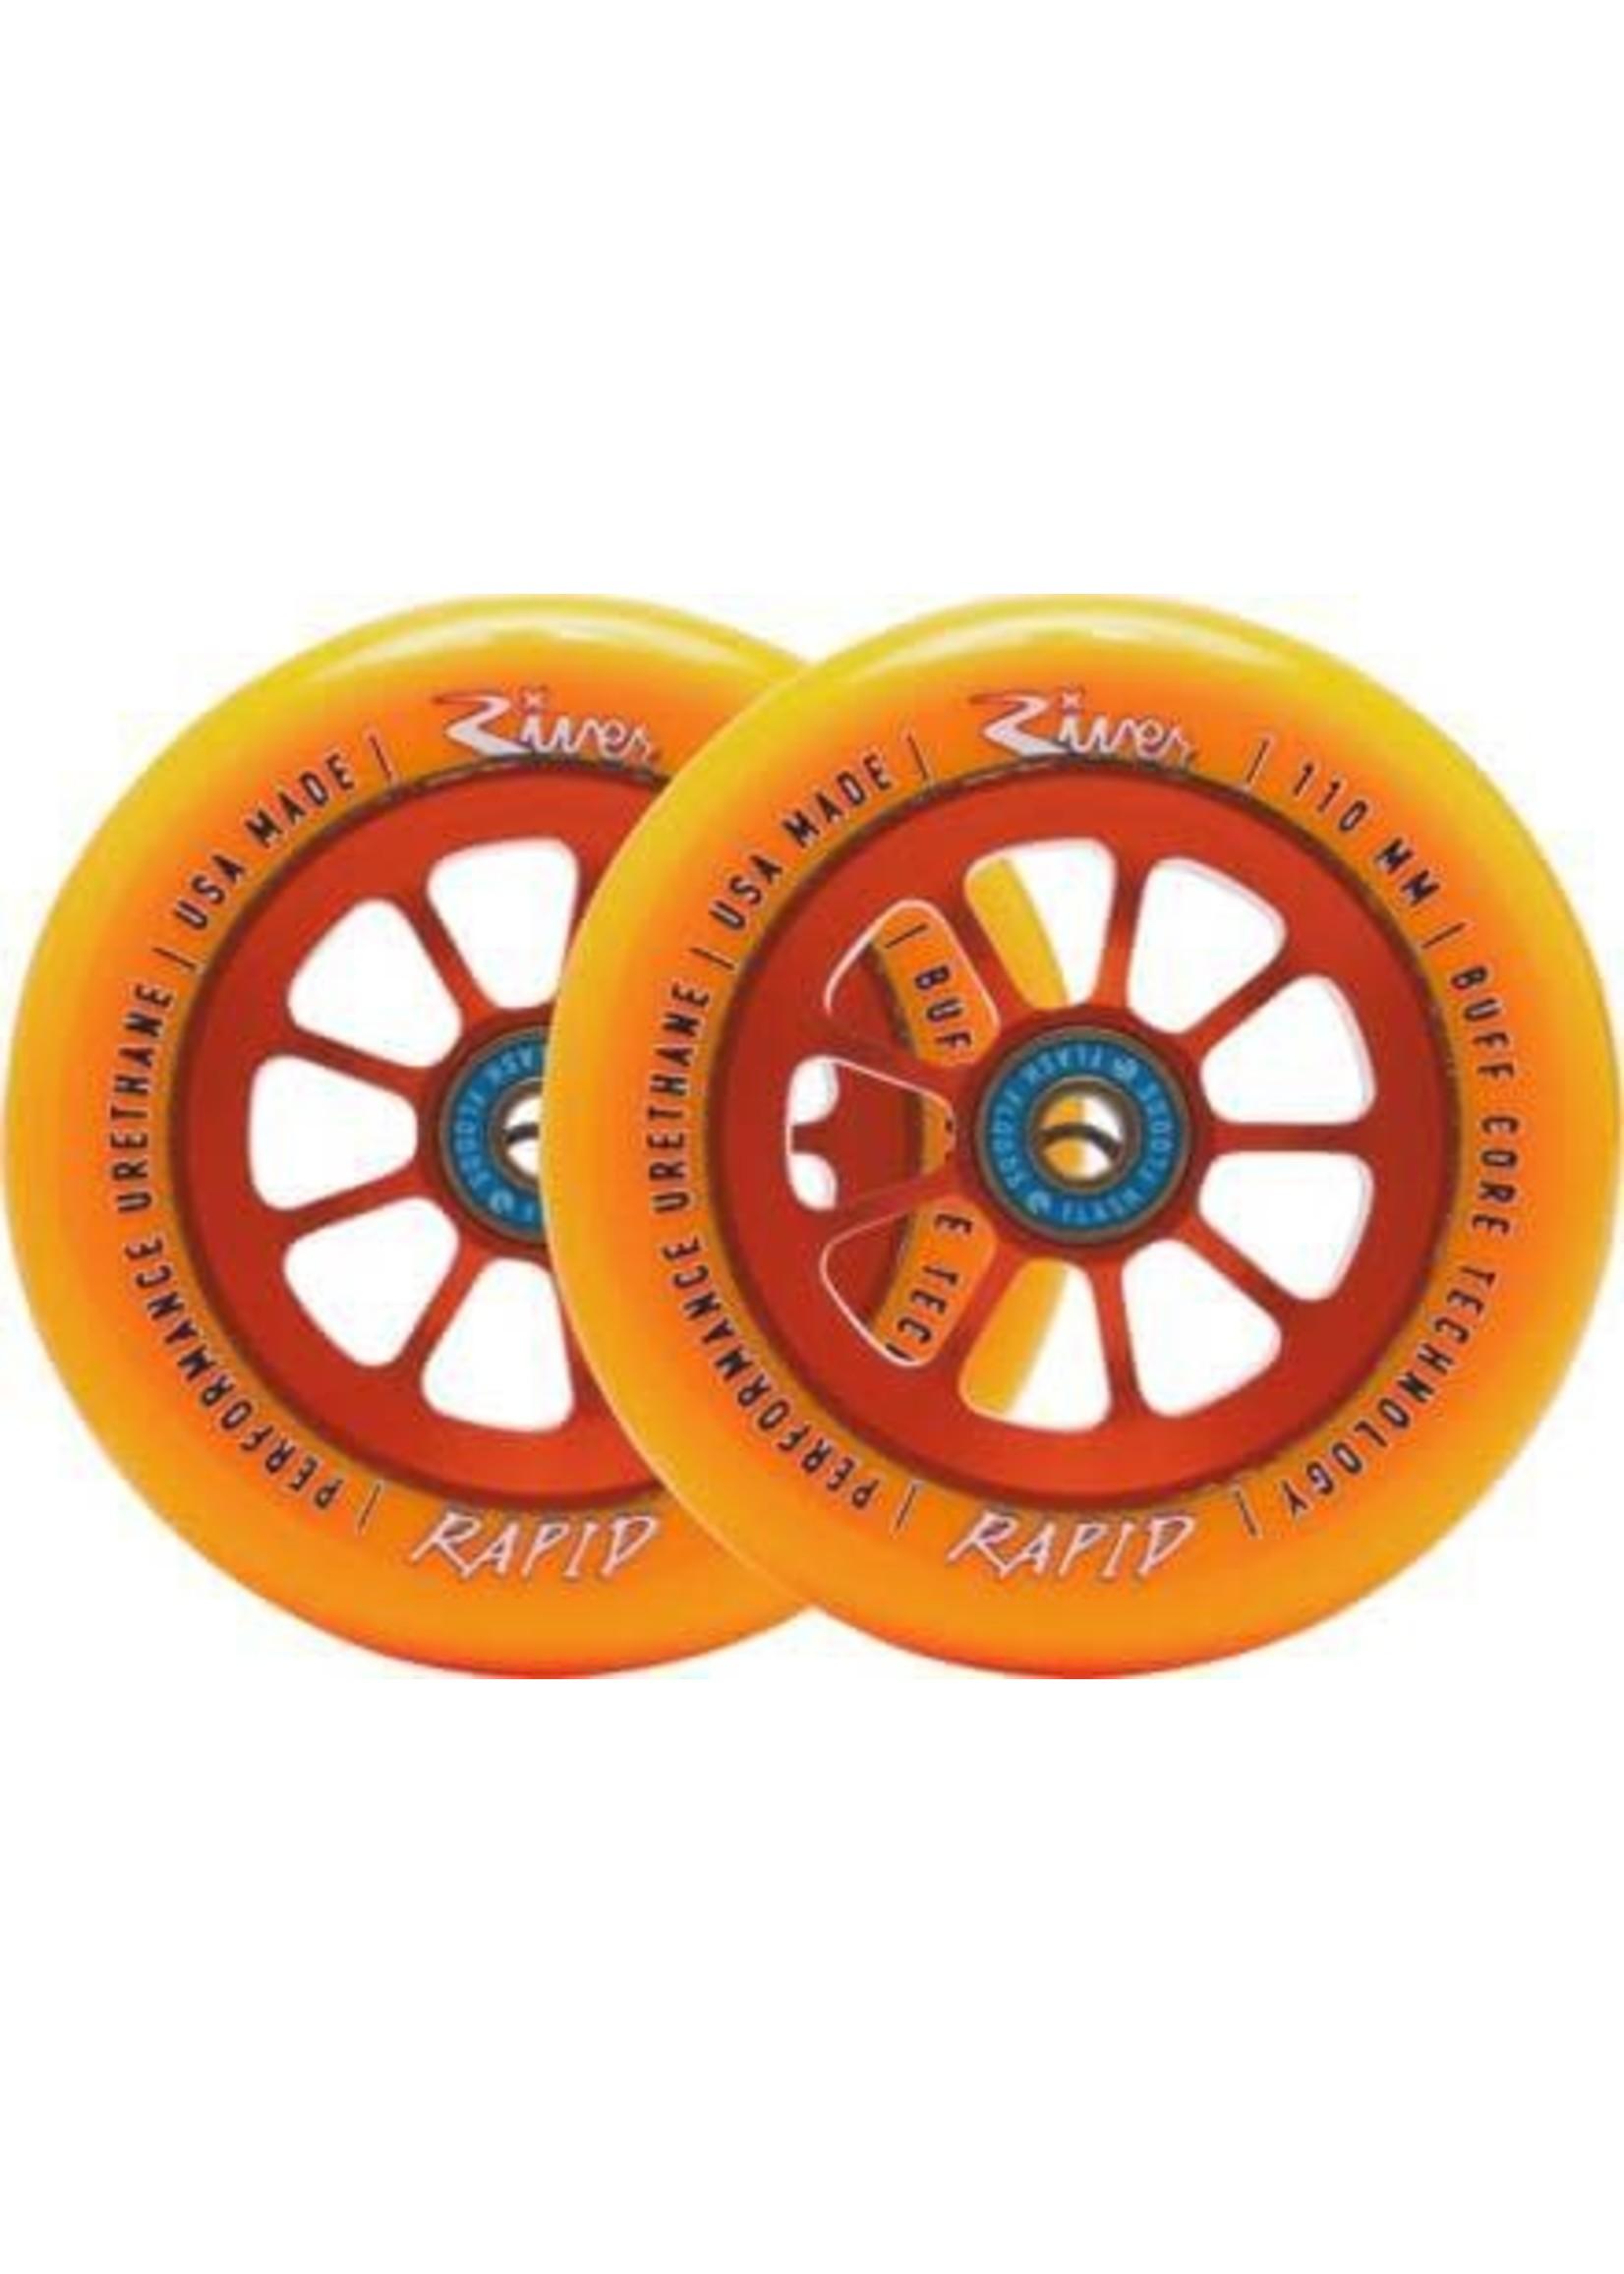 River Wheel Co. River - Rapid Wheels - 110mm